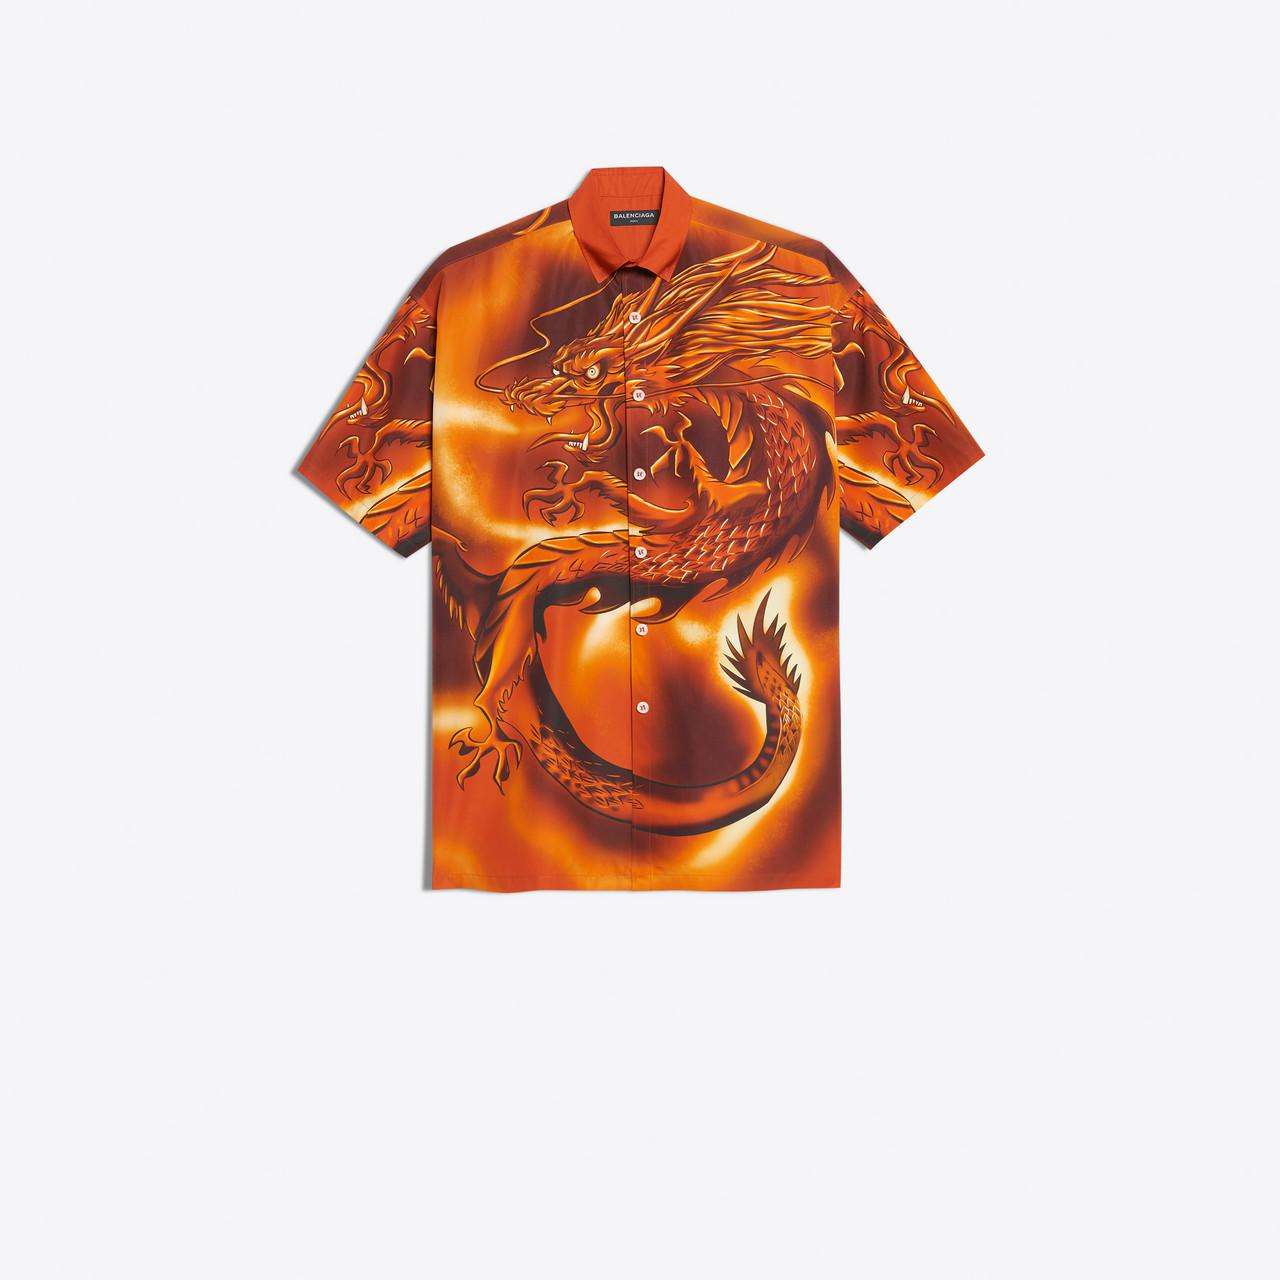 ecc10aedc Balenciaga Big Short Sleeves Shirt Dragon in Orange for Men - Lyst